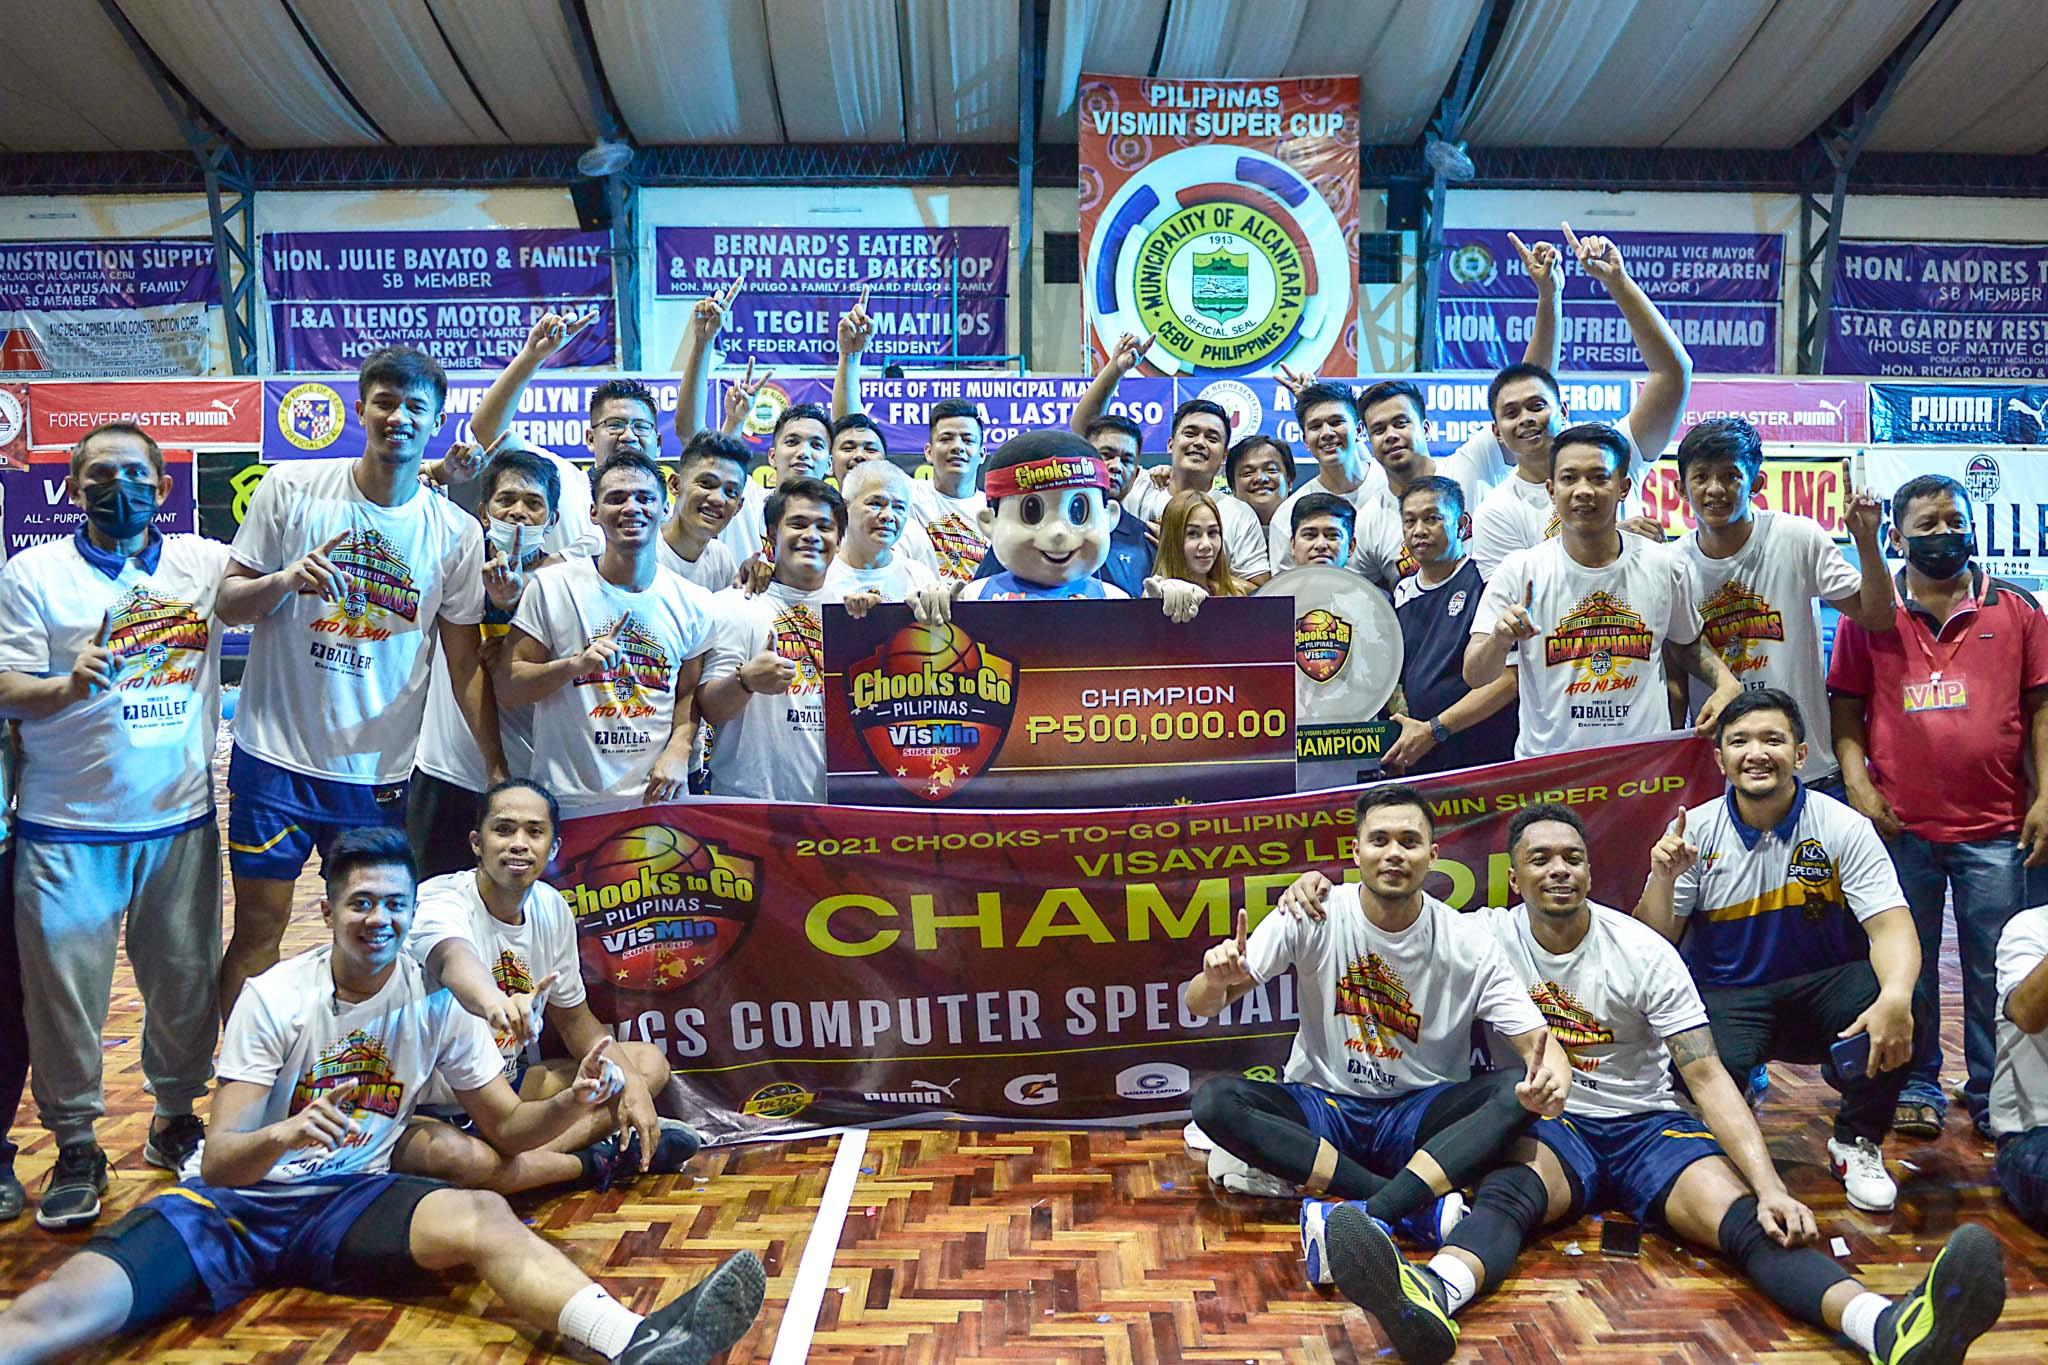 2021-Chooks-to-Go-VisMinCup-Visayas-Finals-Game-3-Talisay-vs-Mandaue-KCS-champions Mike Reyes finally finds gift of tongue brother Chot had Basketball News VisMin Super Cup  - philippine sports news